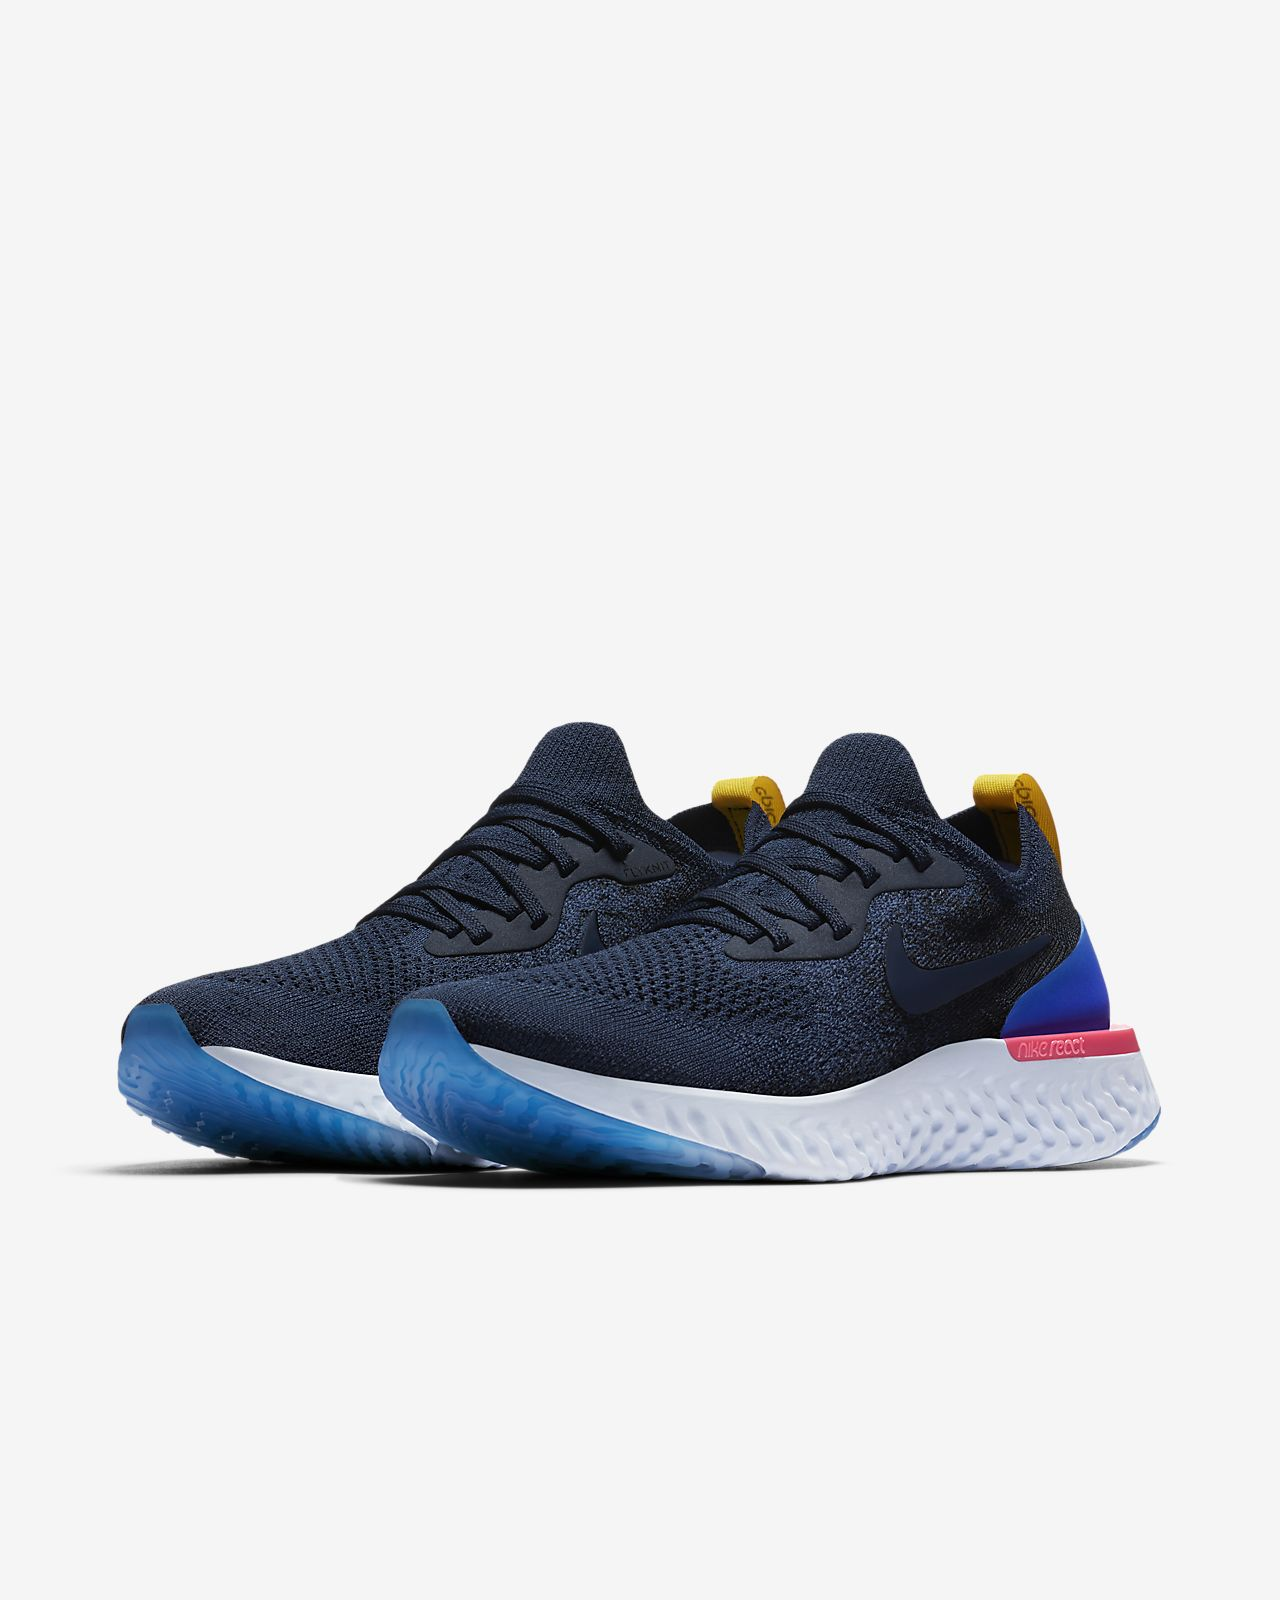 new products 2fa76 72128 ... switzerland nike epic react flyknit nike epic react flyknit womens  running shoe 4d3de 54a0e